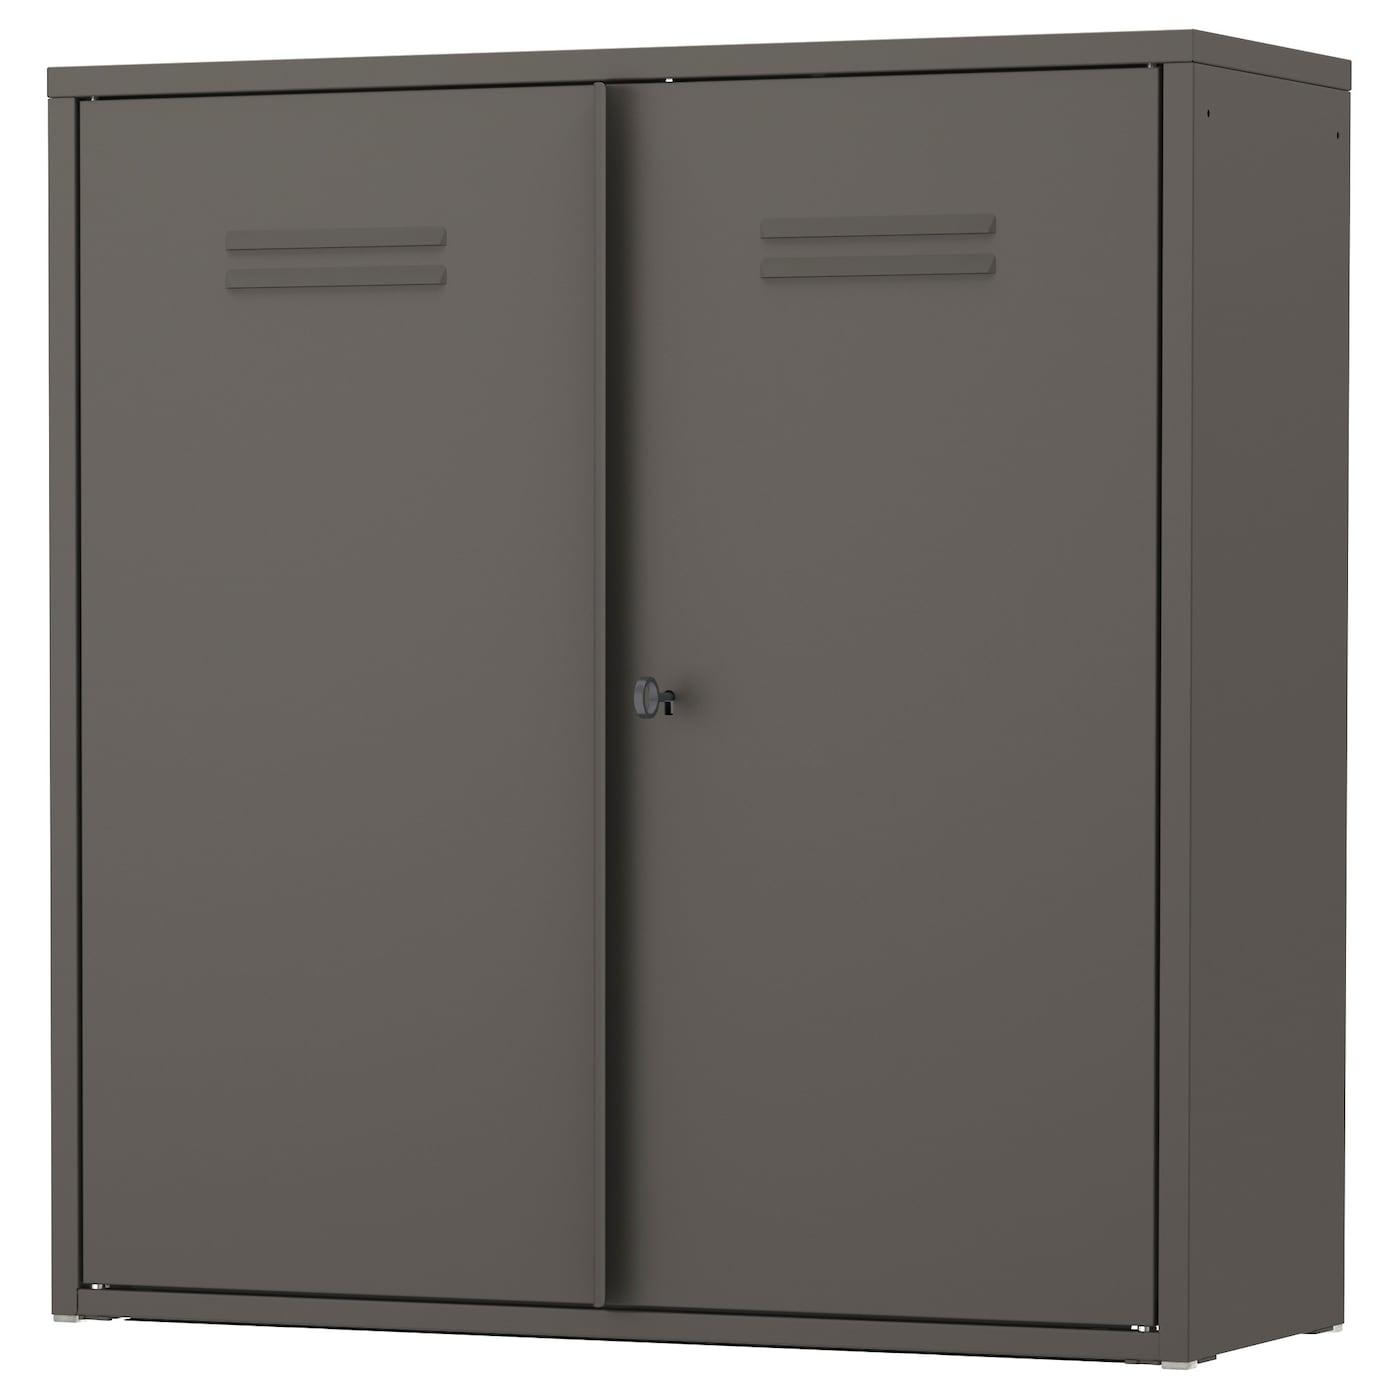 ivar cabinet with doors grey 80x83 cm ikea. Black Bedroom Furniture Sets. Home Design Ideas